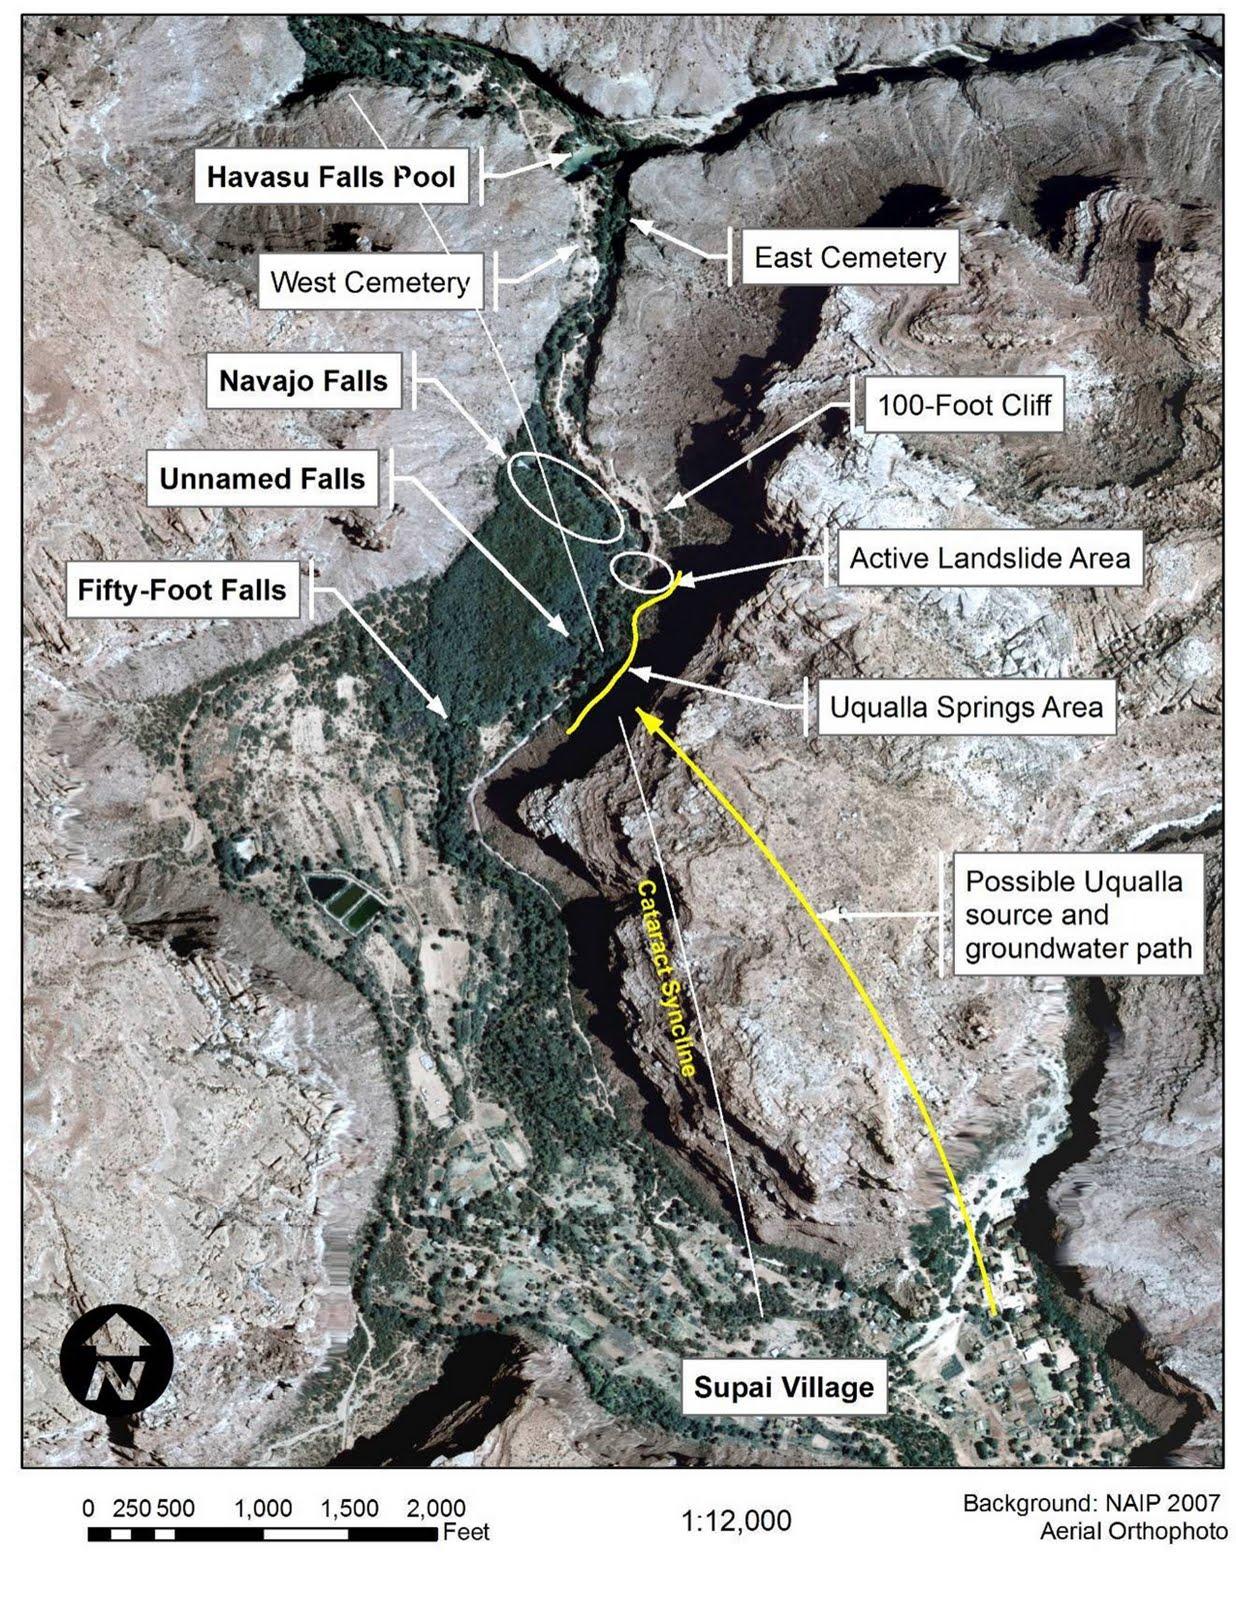 Arizona Geology Flooding Hits Havasupai Area